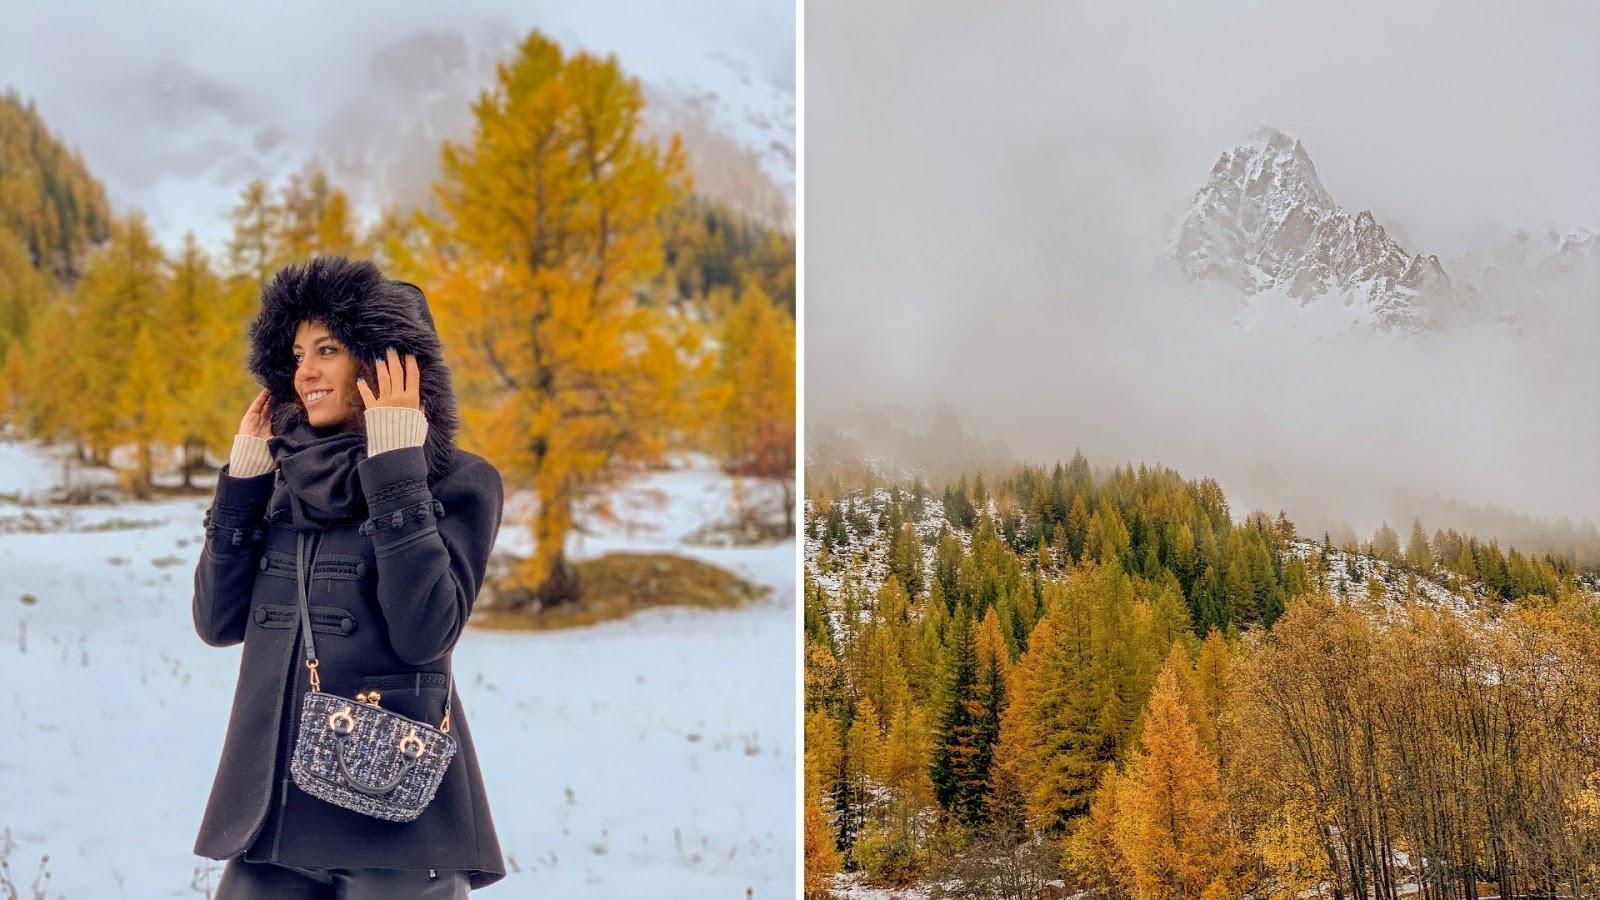 week end autunnale a Courmayeur monte bianco, autunno a Courmayeur, valentina rago, fashion need, fashion blog Italia